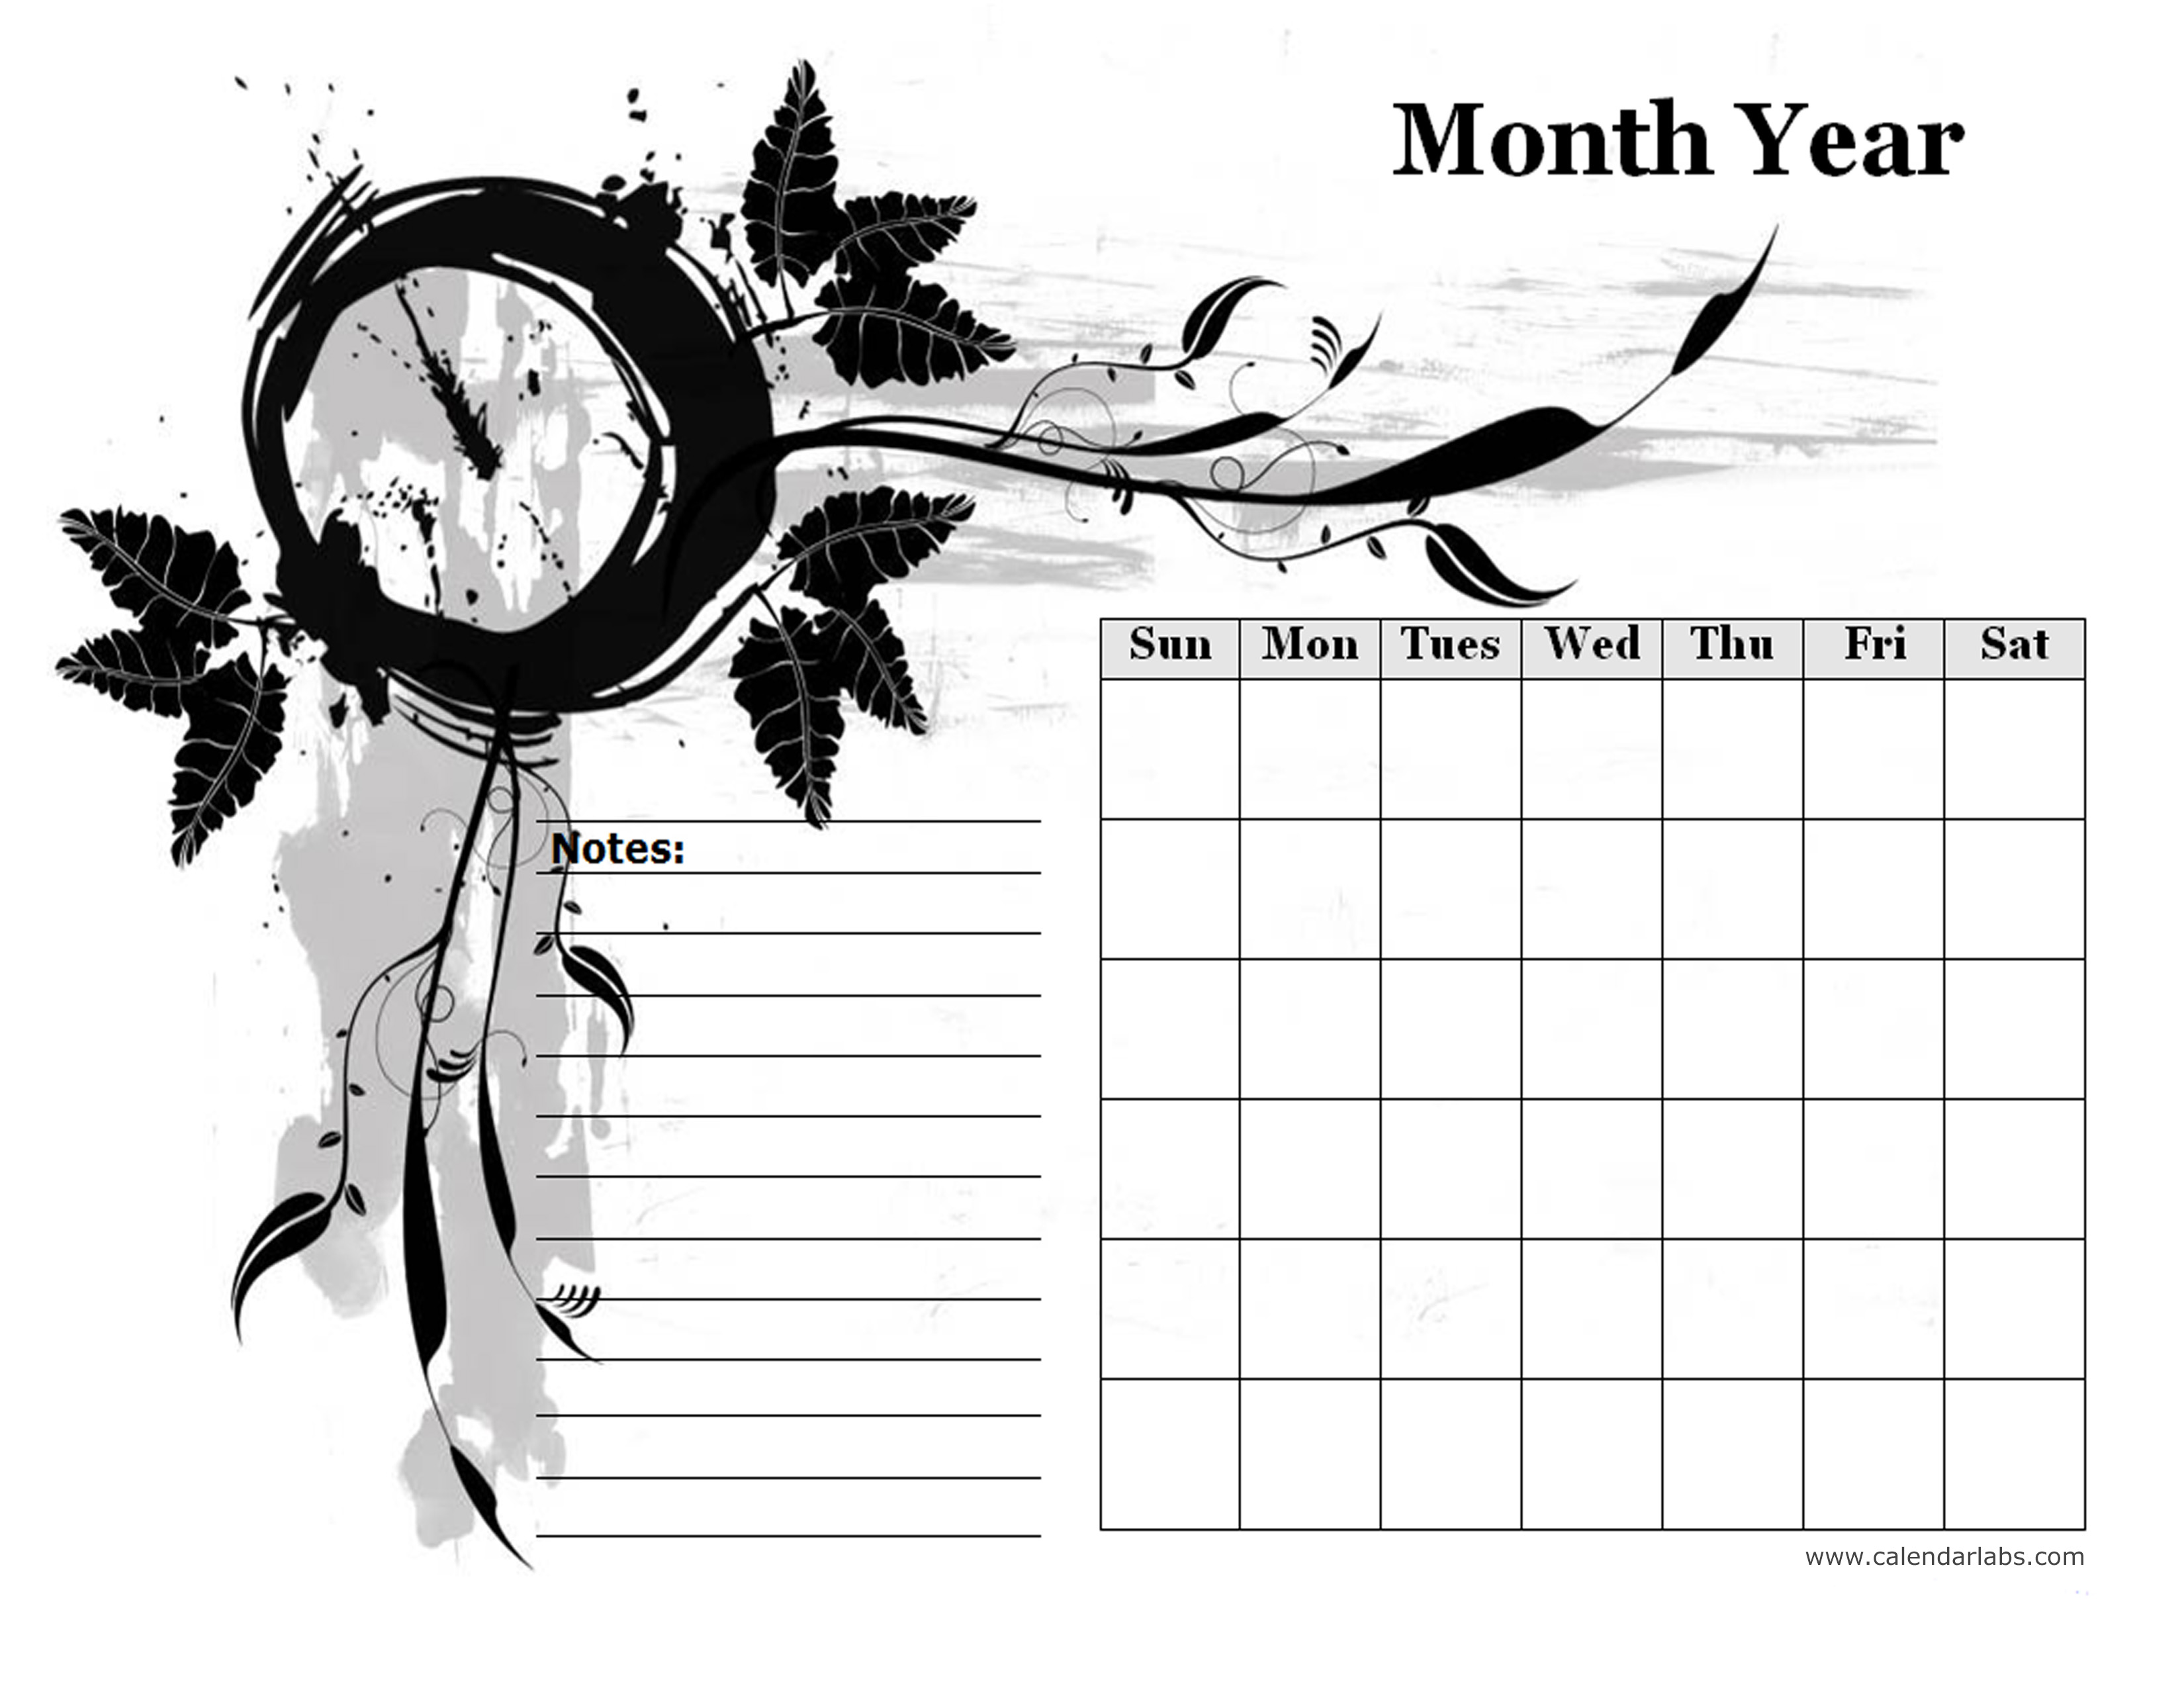 Monthly Blank Calendar In Designer Monochrome Free Printable Templates